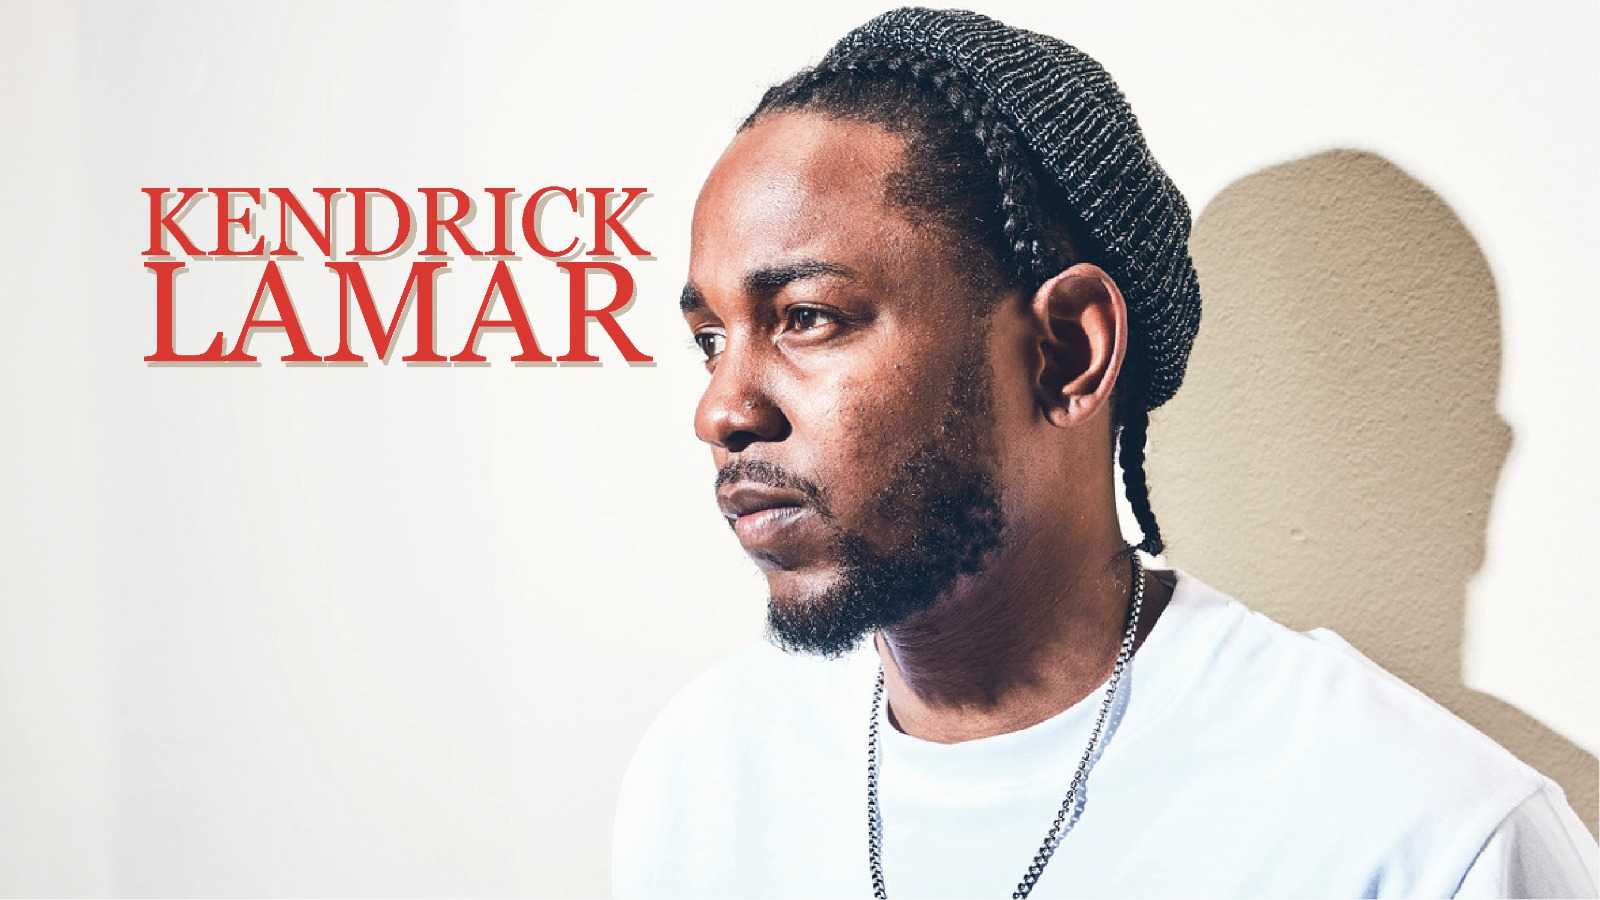 Kendrick Lamar, digne Héritier du Rap de la West Coast 🌴